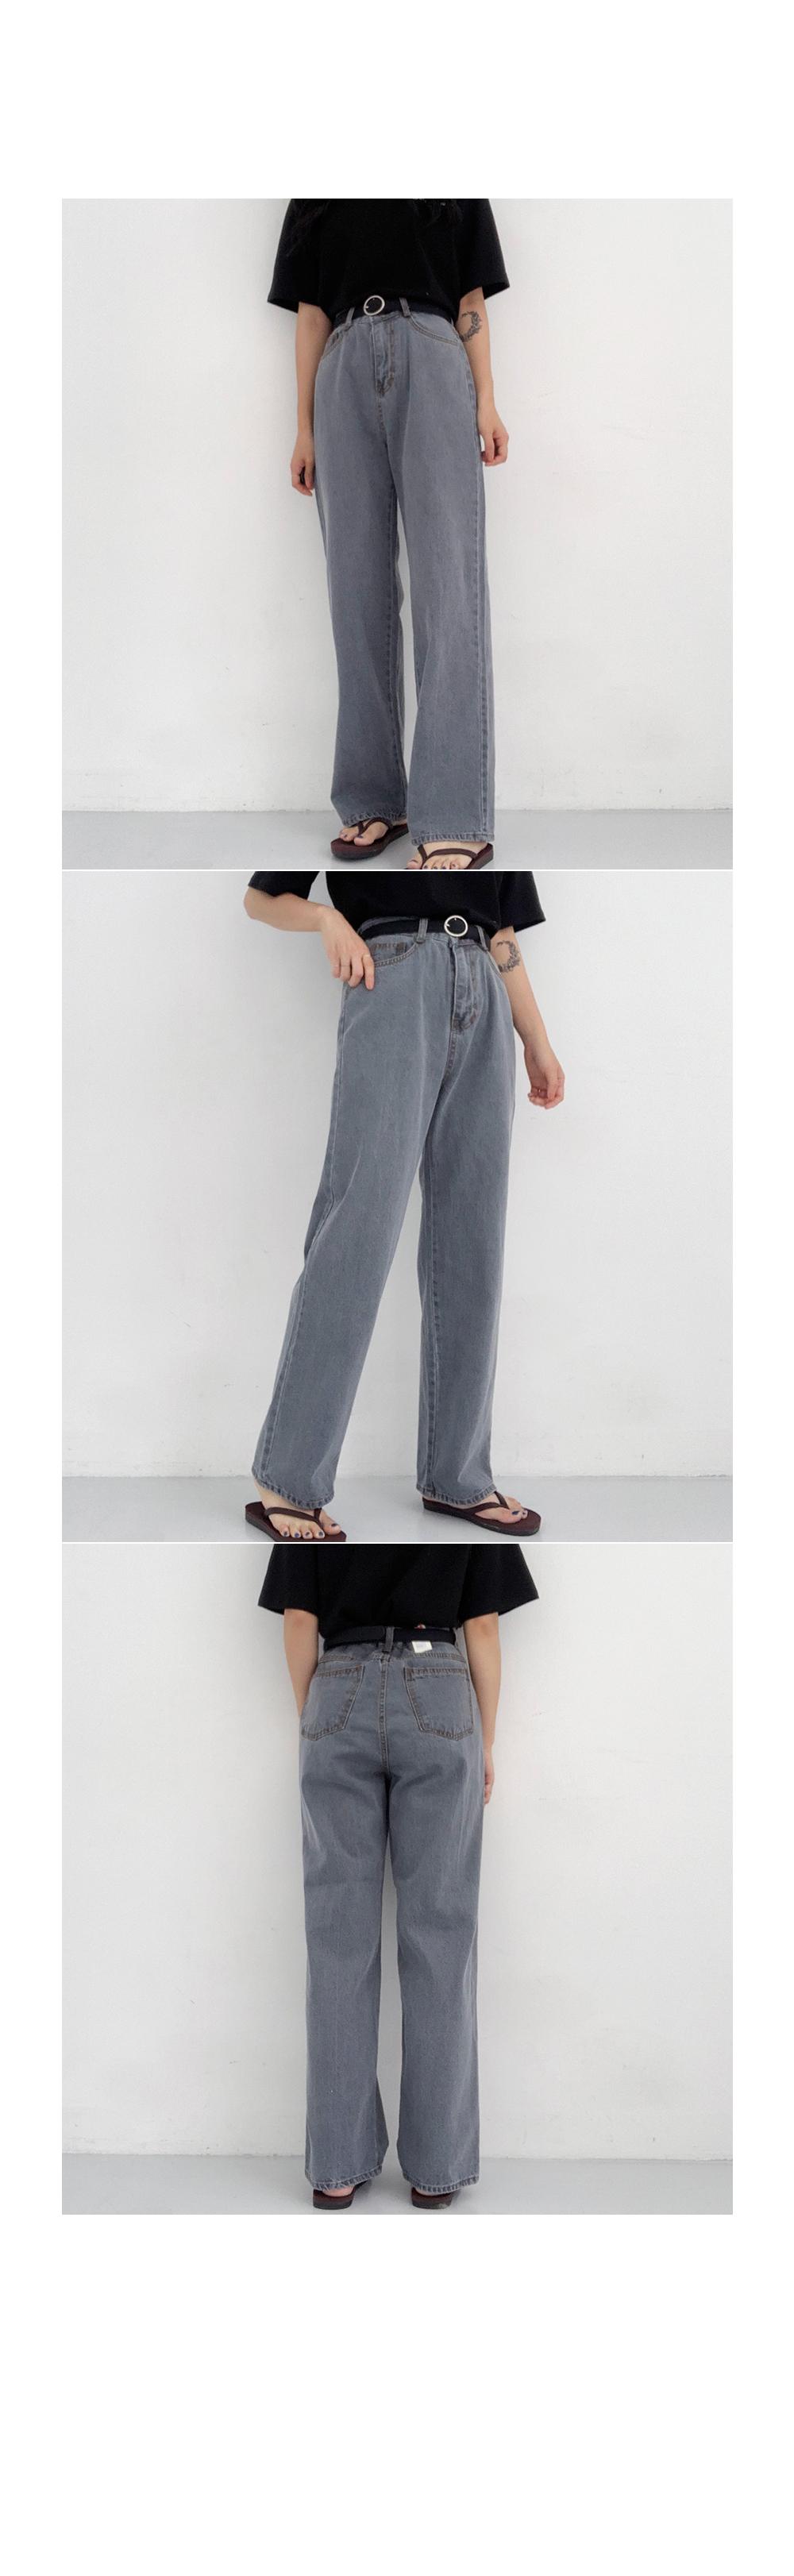 Black Gray Denim Pants